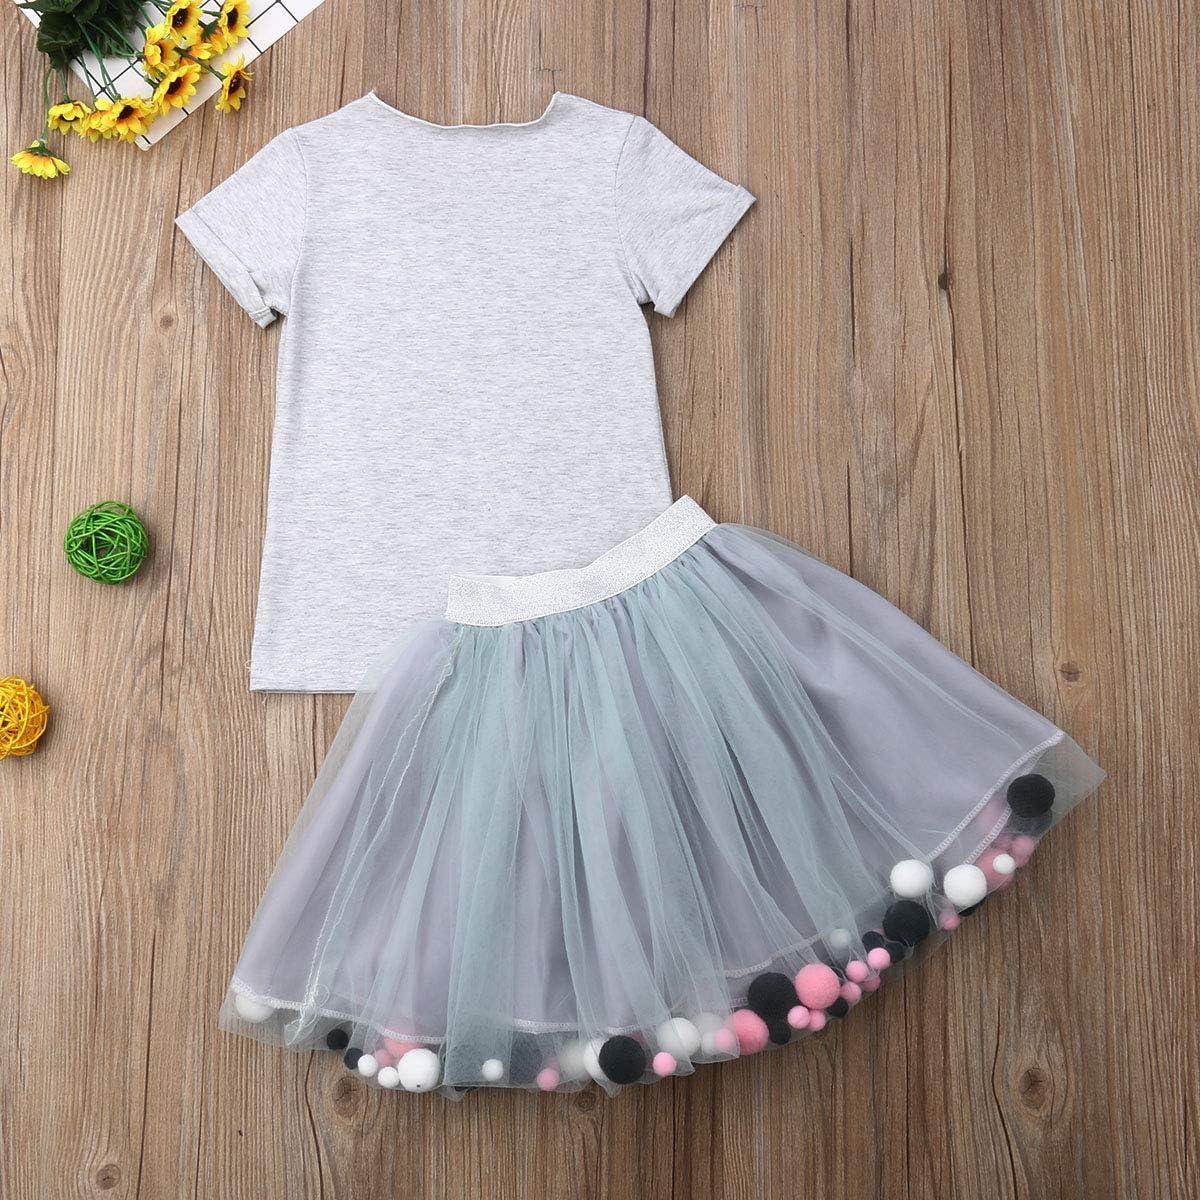 Toddler Kids Clothing Baby Girls Cute Eyelash T-Shirt Top+Tulle Party Tutu Mini Skirt 2Pcs Outfits Clothes Set